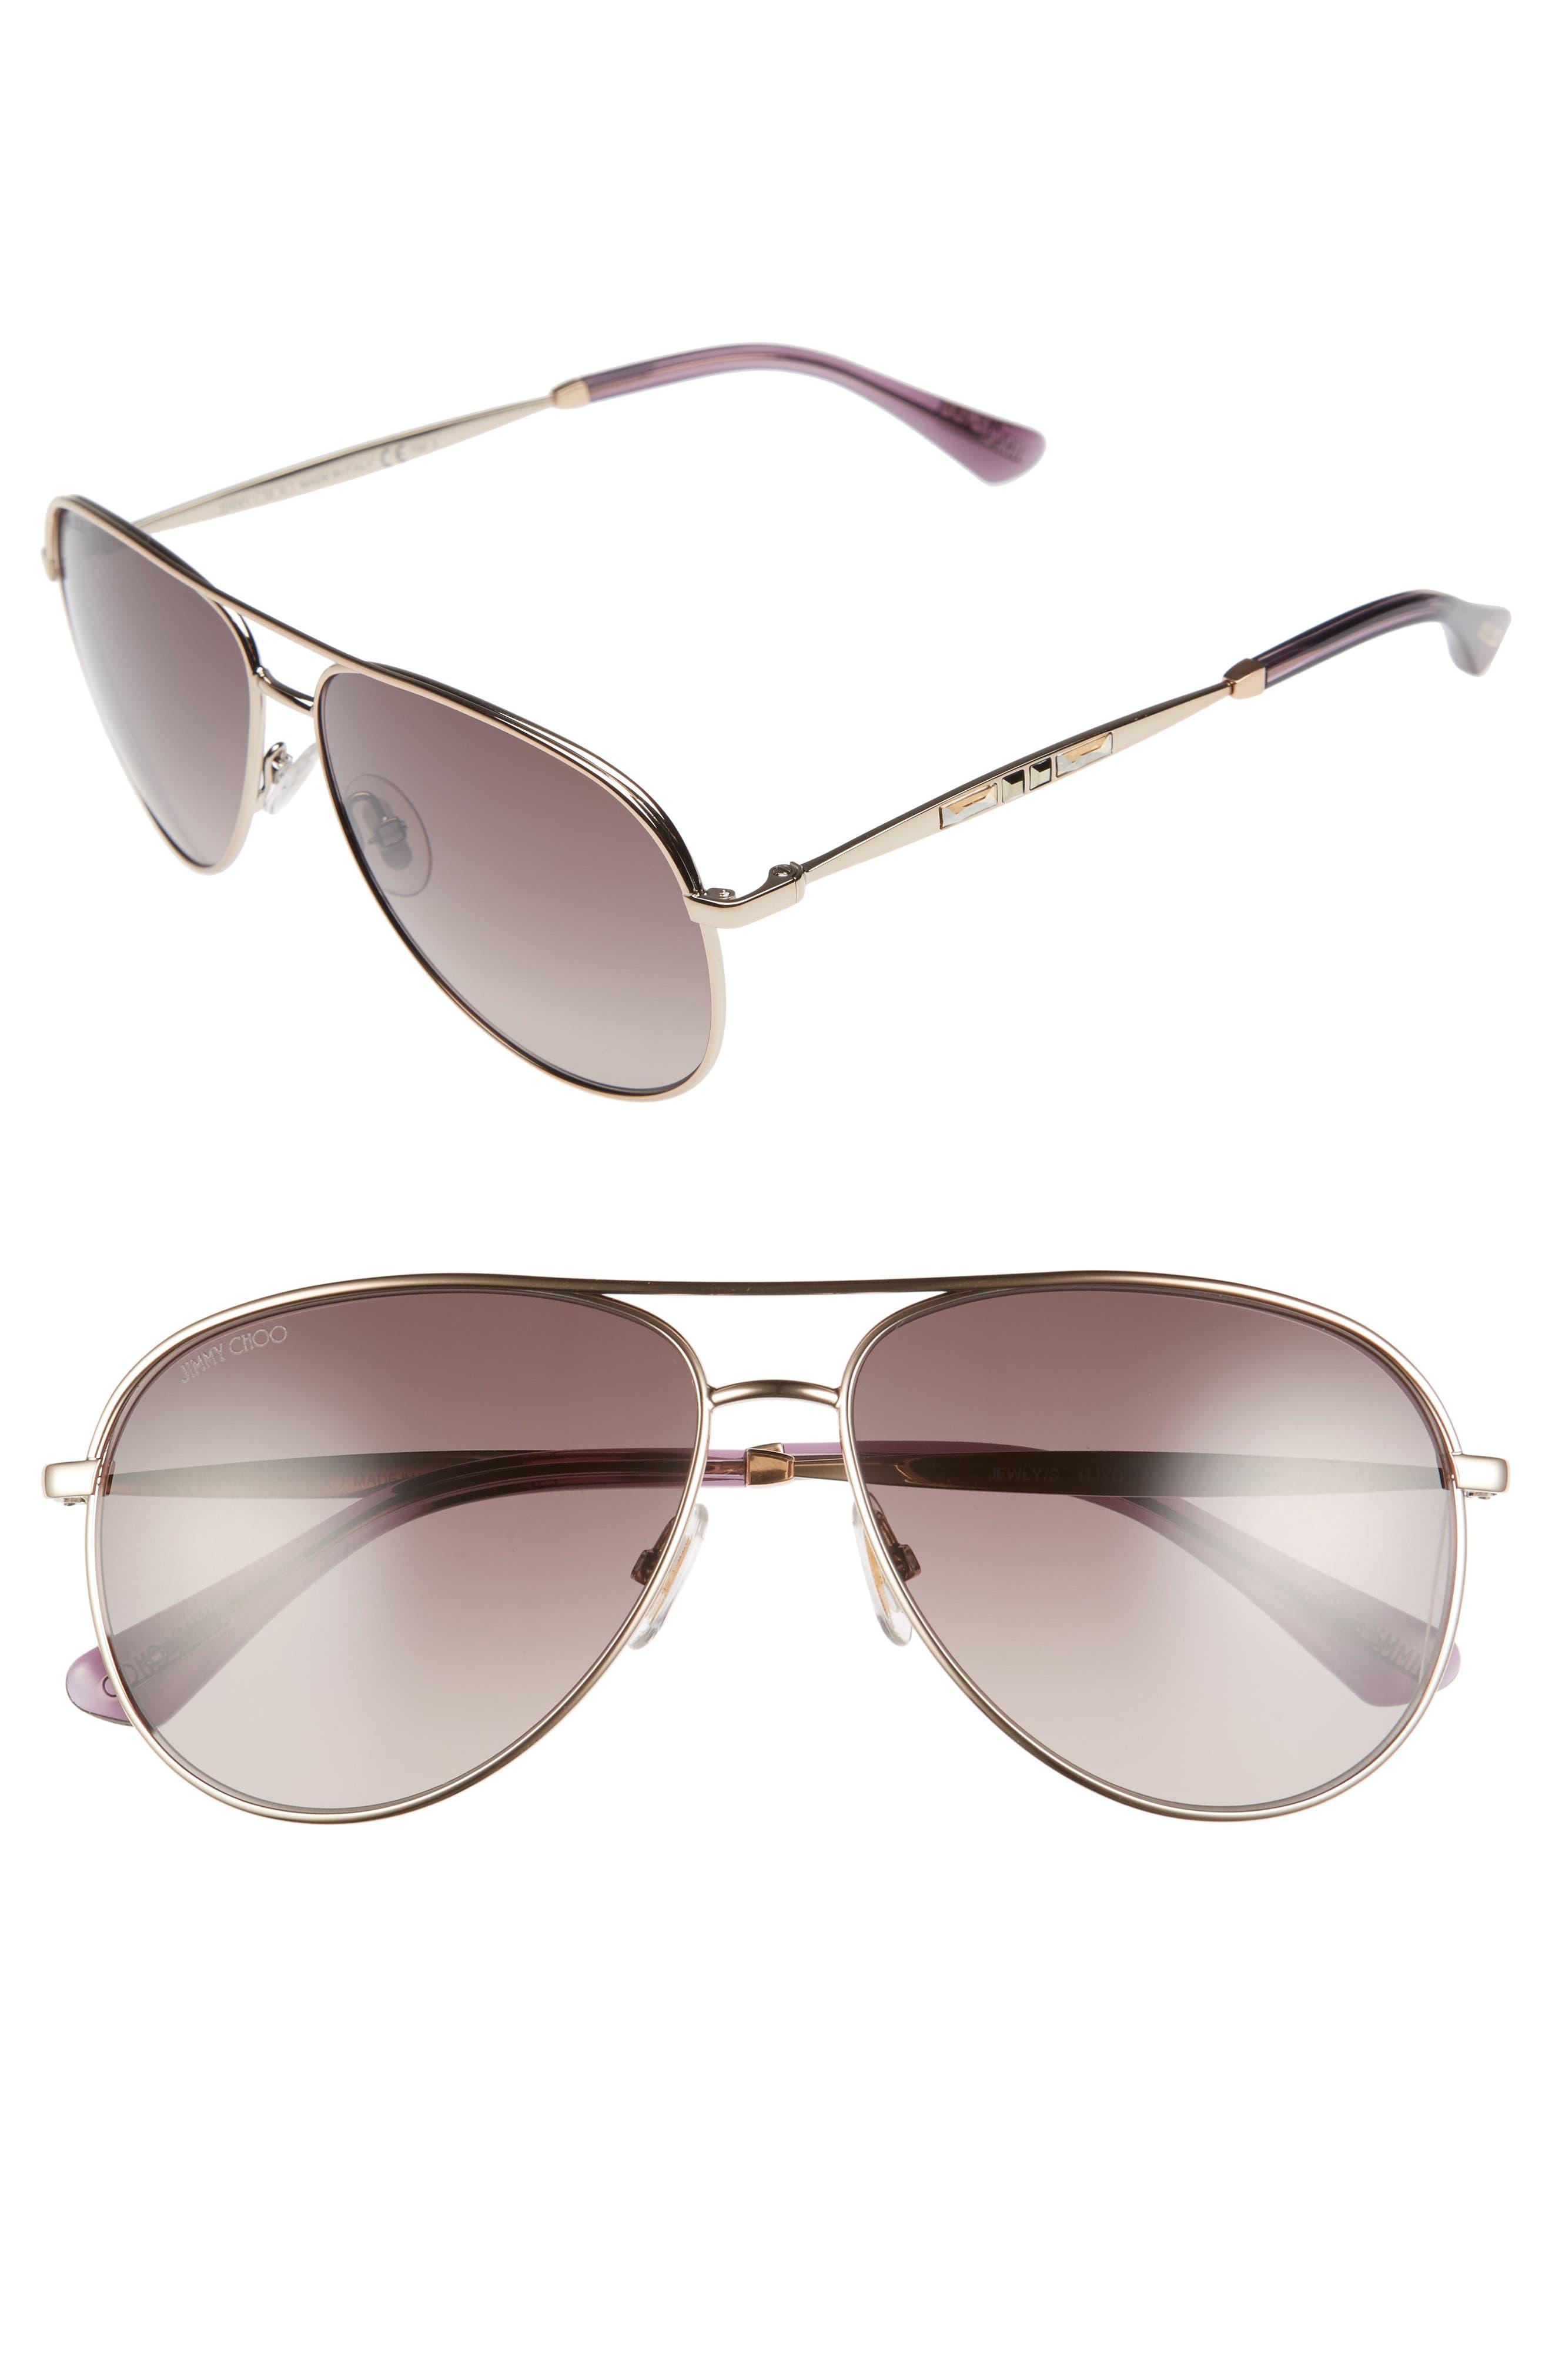 Jewlys 58mm Aviator Sunglasses,                             Main thumbnail 1, color,                             220